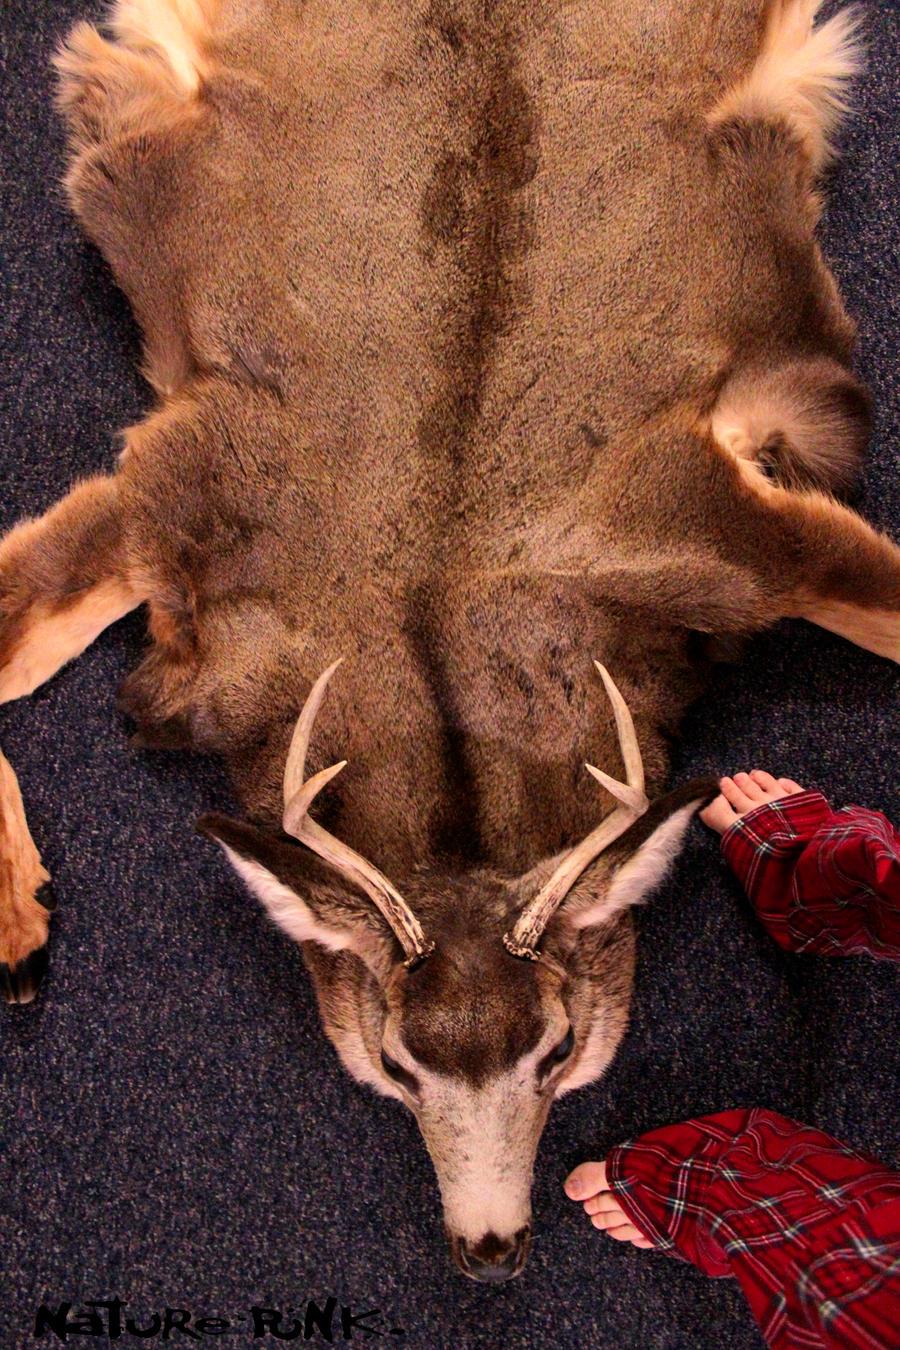 Amazing Deer Skin Rug By NaturePunk Deer Skin Rug By NaturePunk